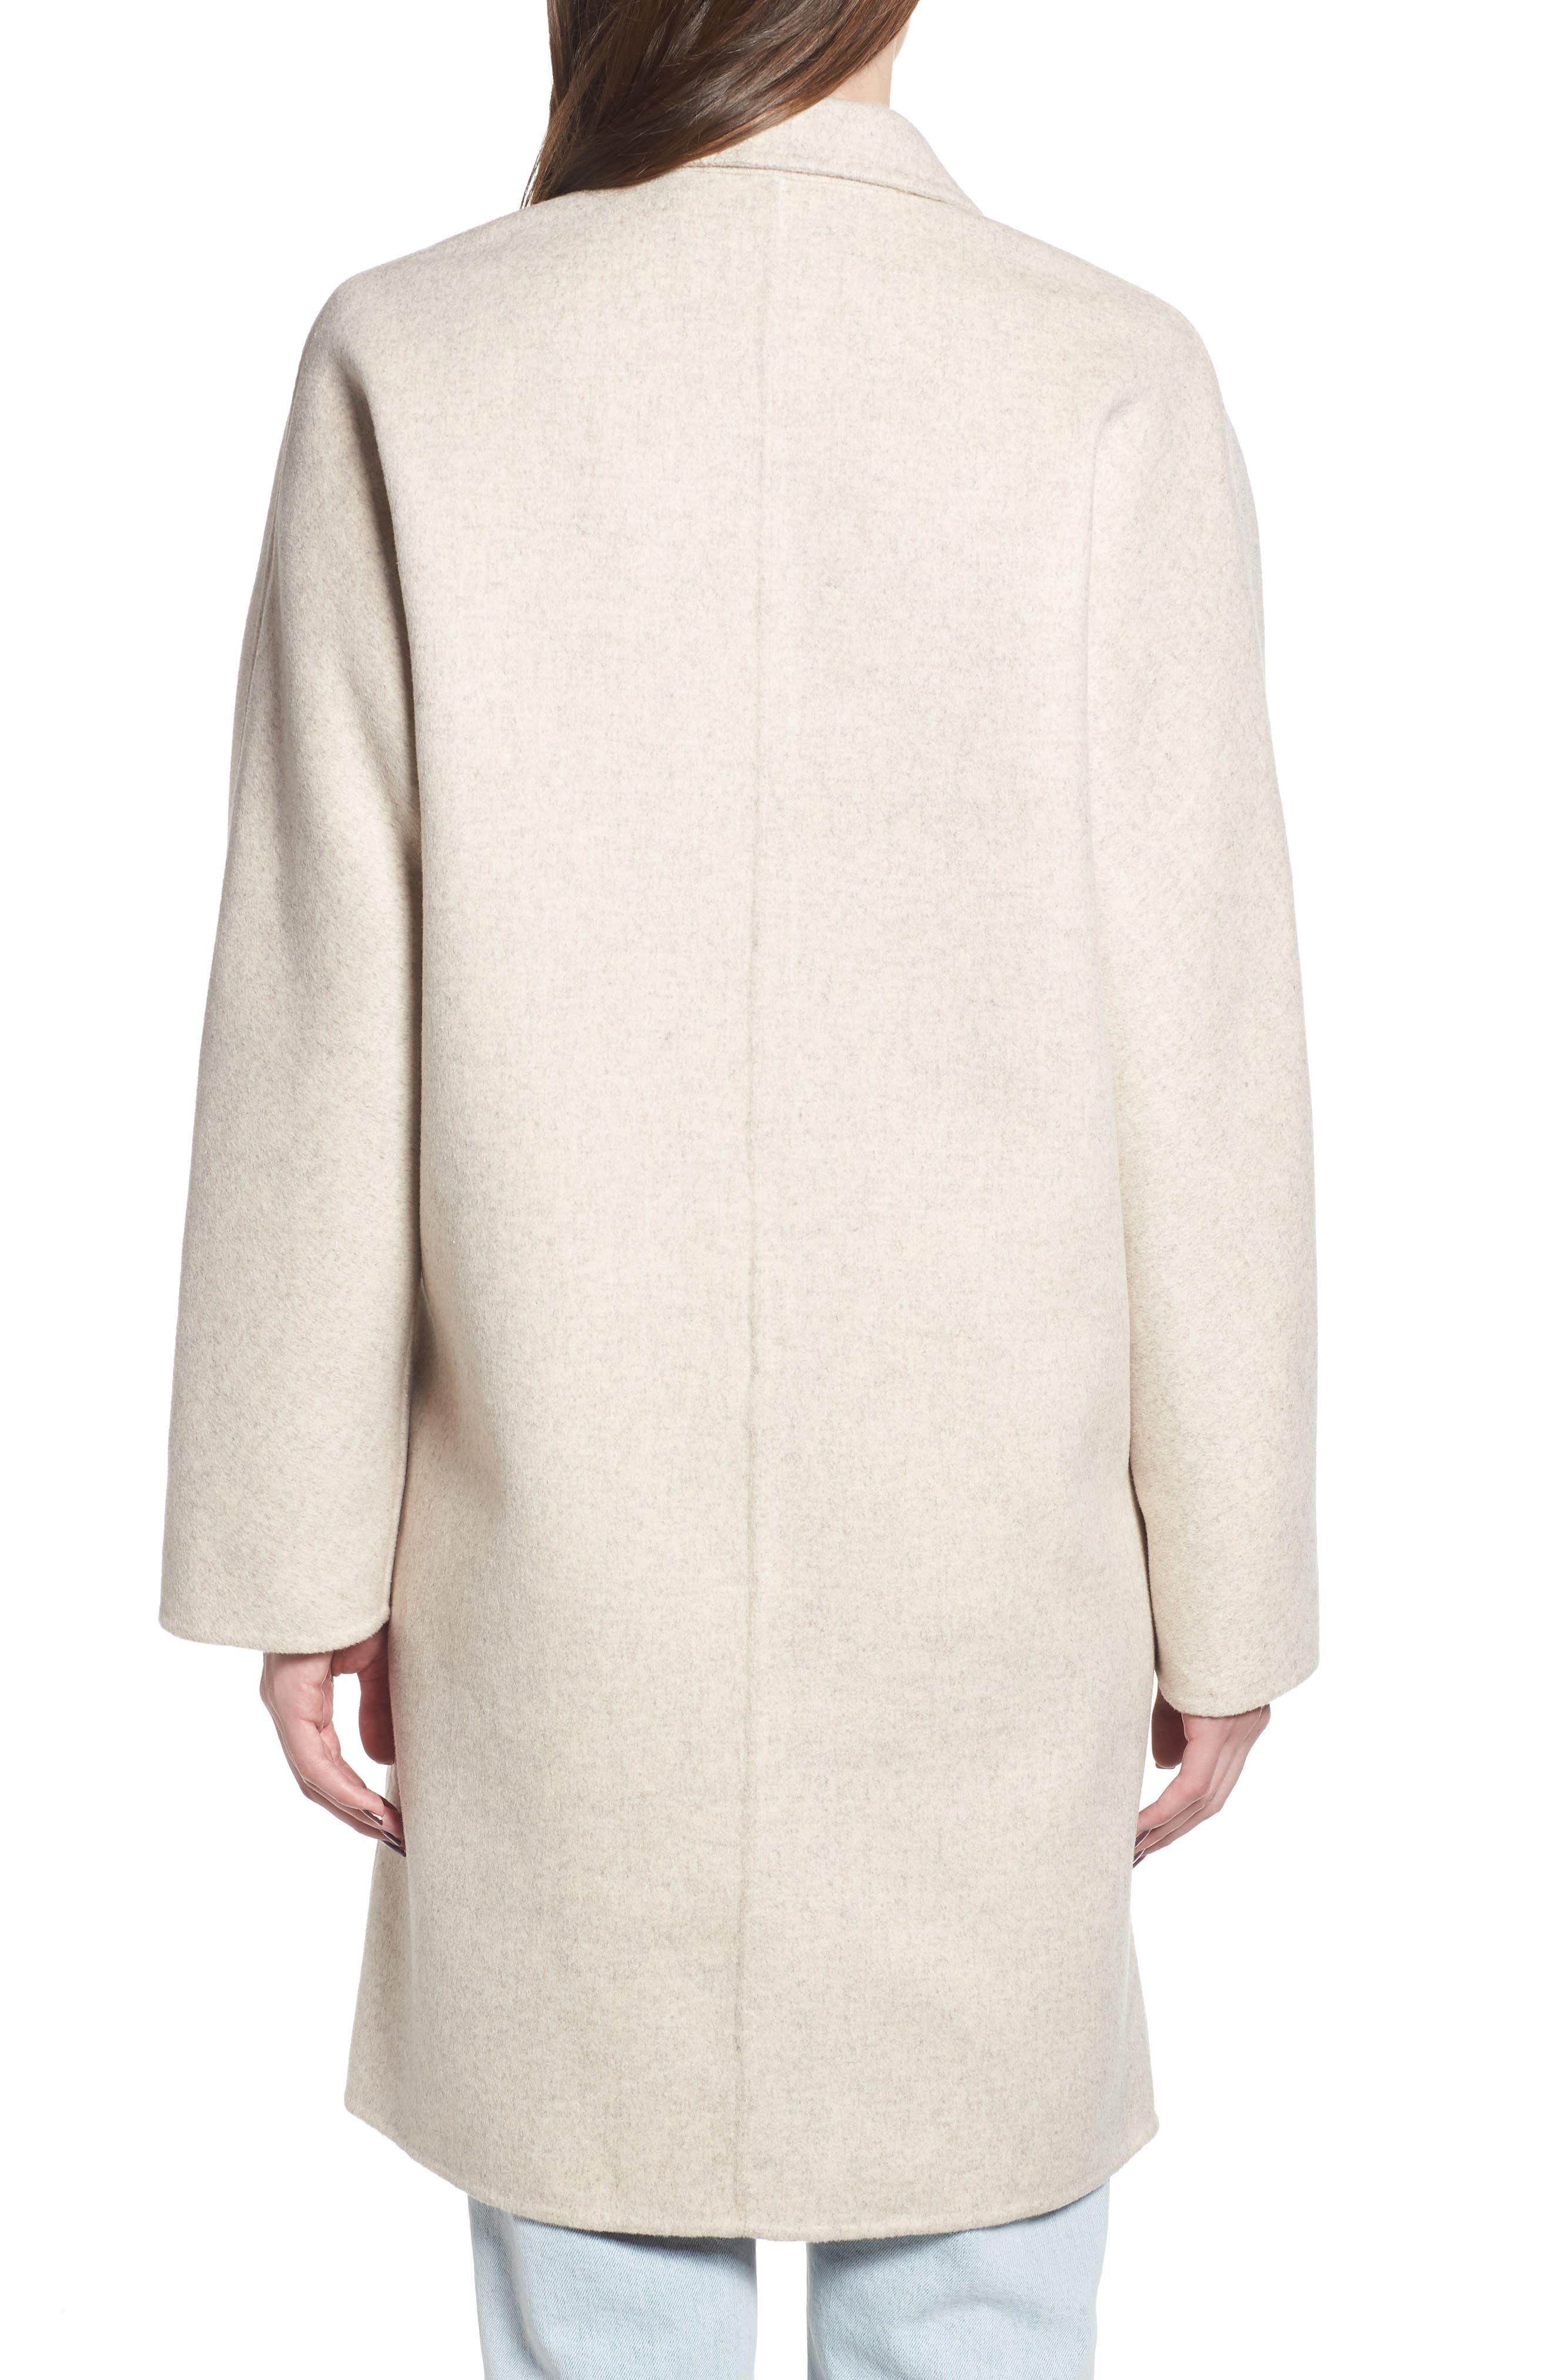 Everest Wool Blend Coat,                             Alternate thumbnail 3, color,                             905